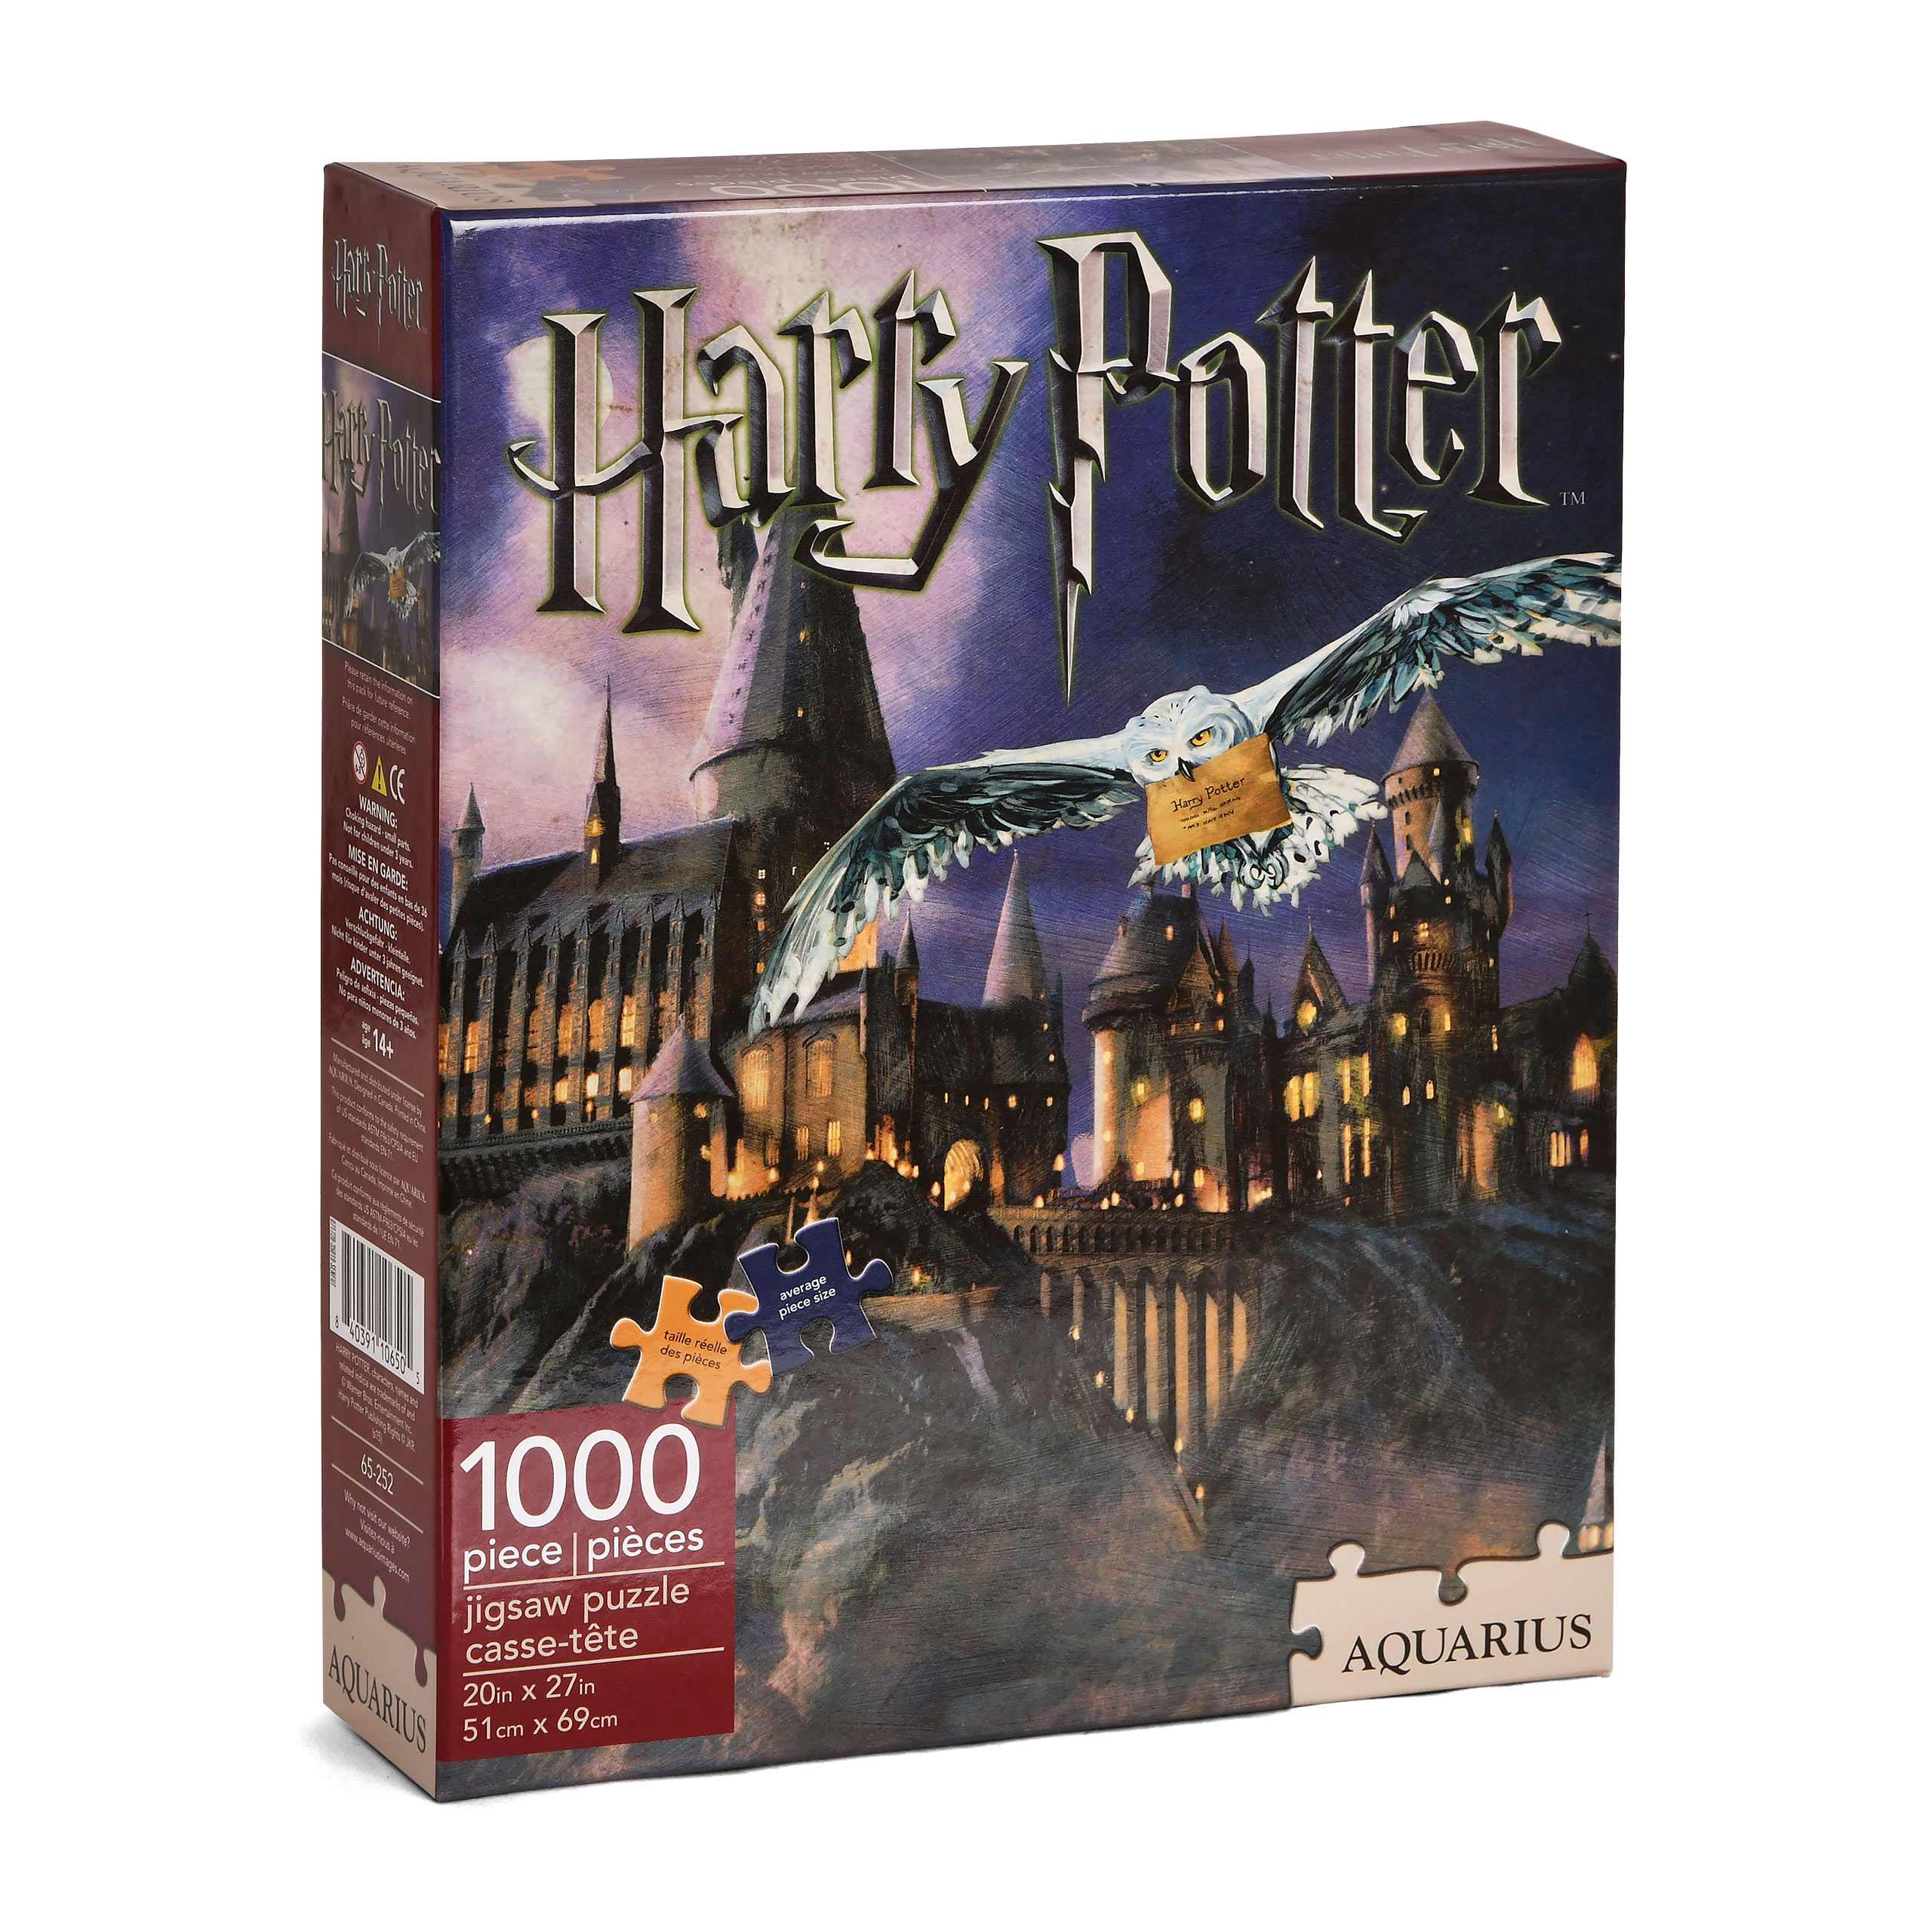 Harry Potter - Hogwarts Schloss Puzzle 1000 Teile